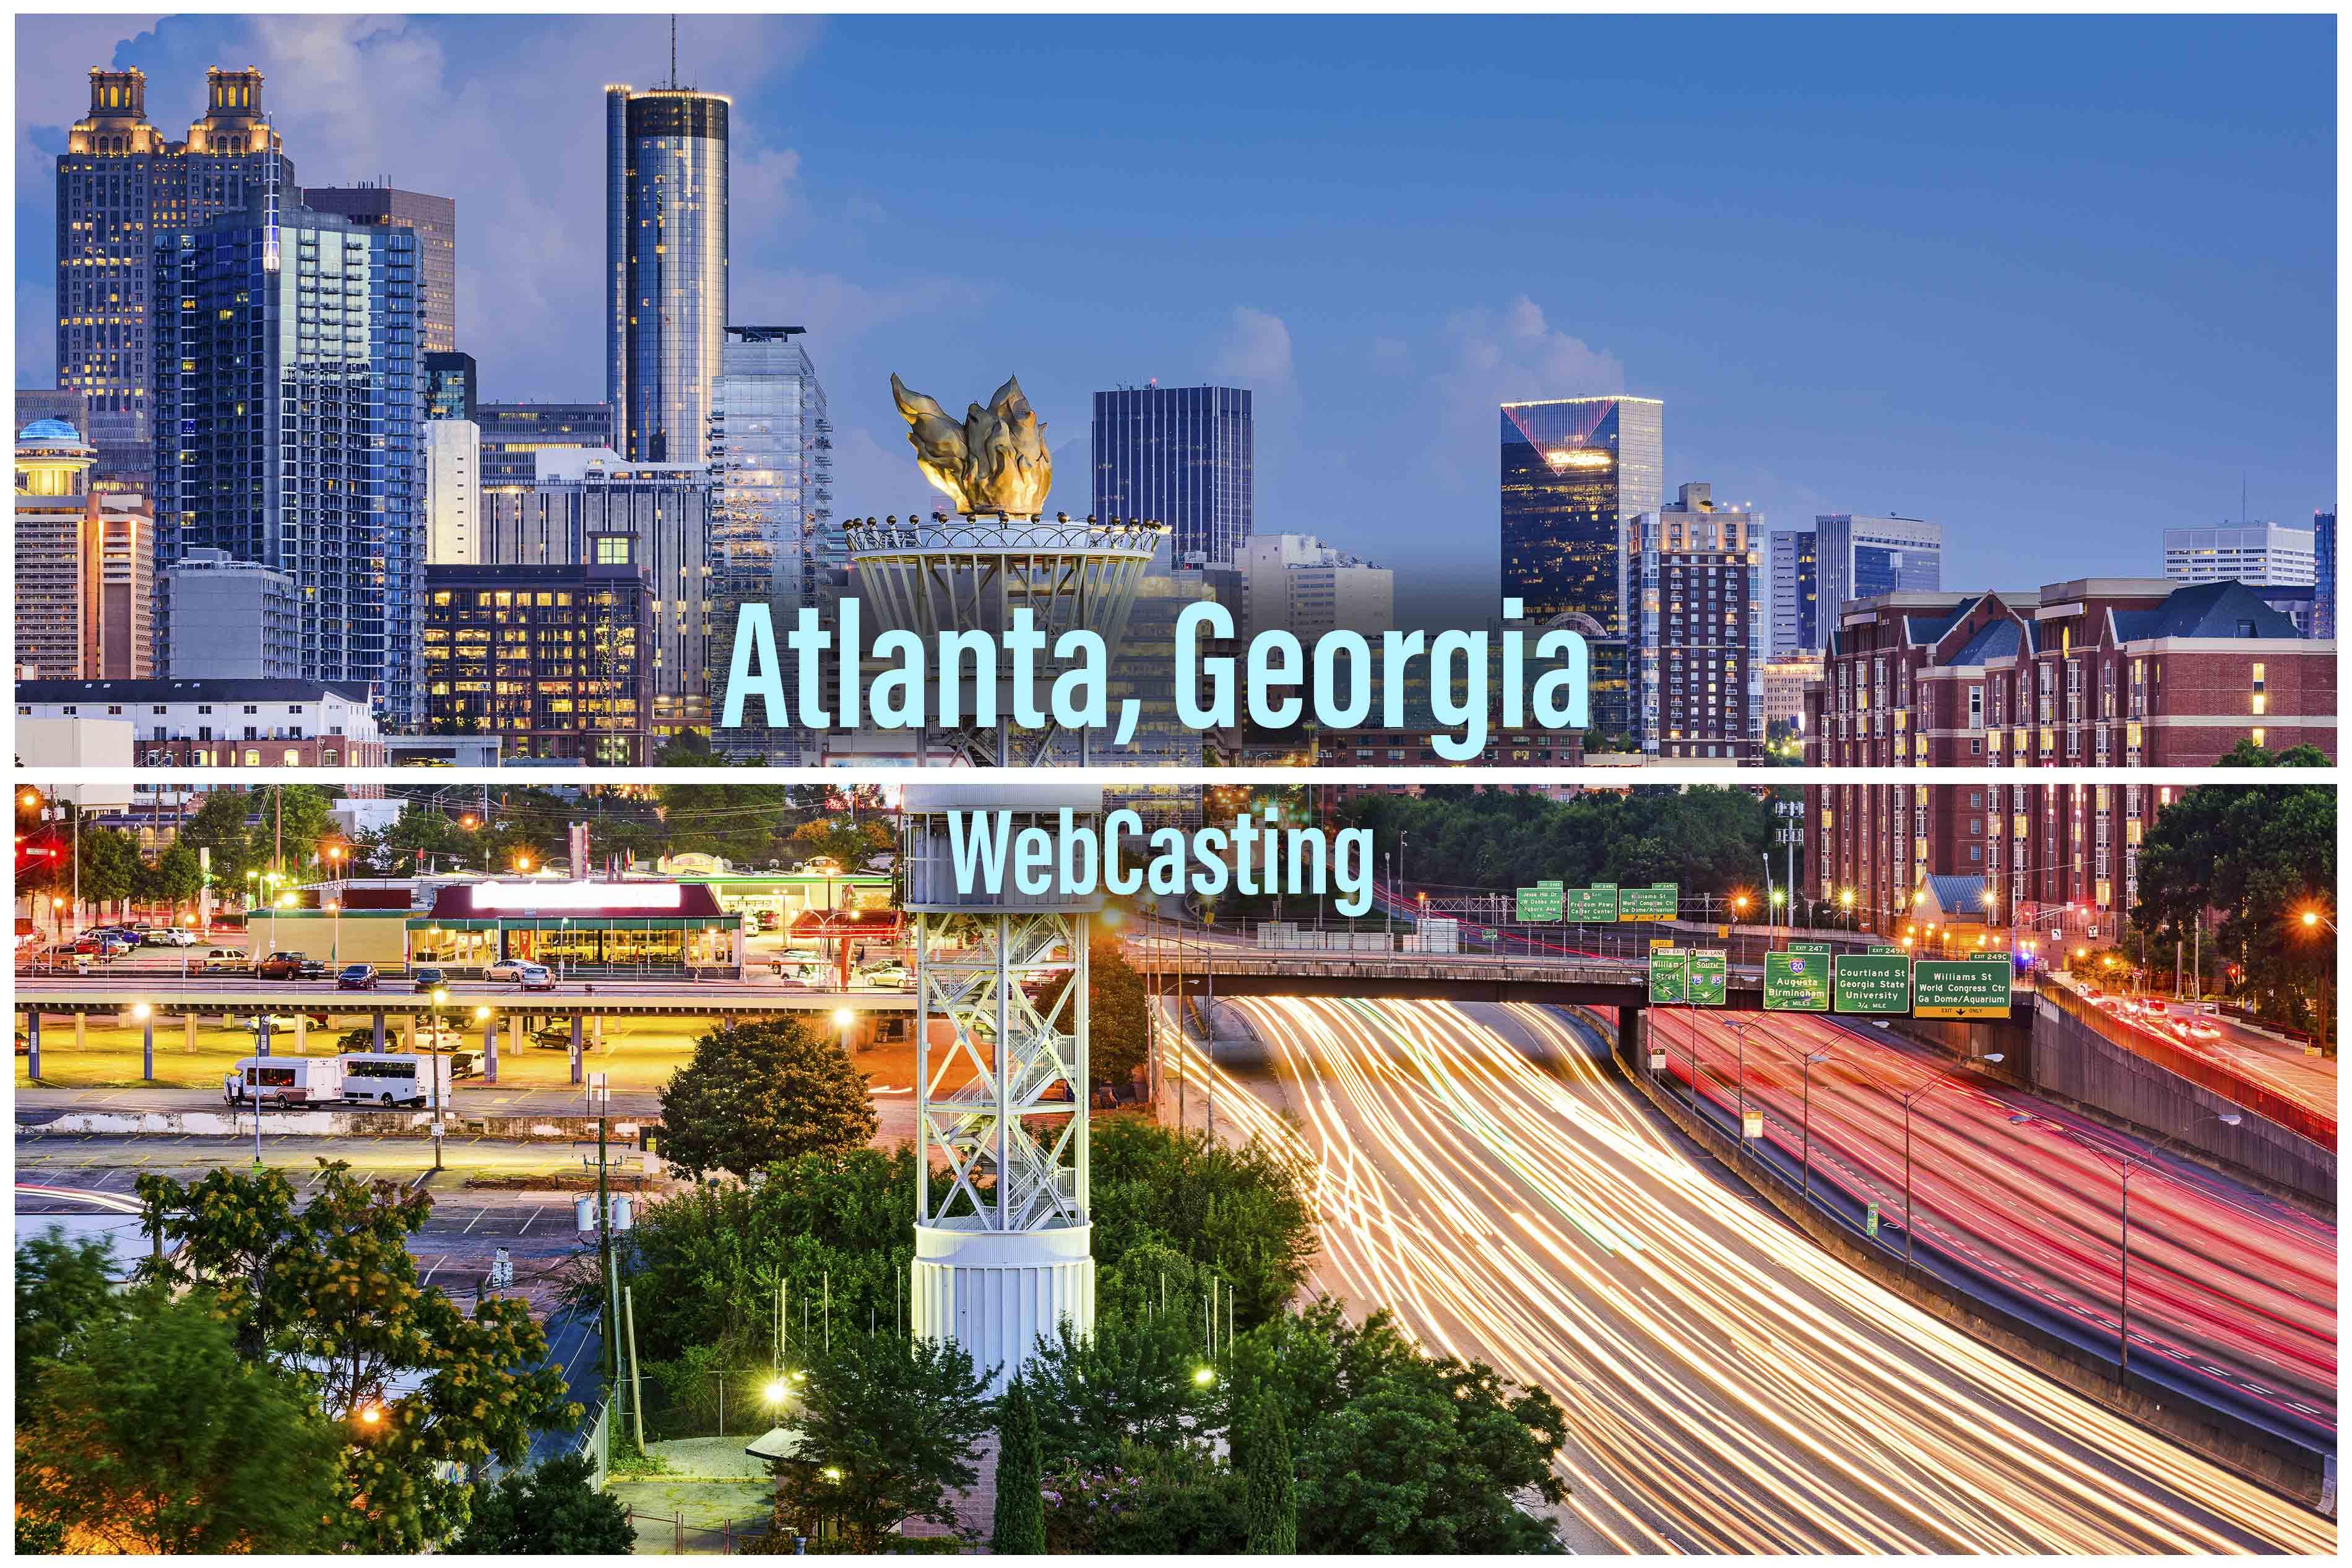 WebCasting Atlanta skyline